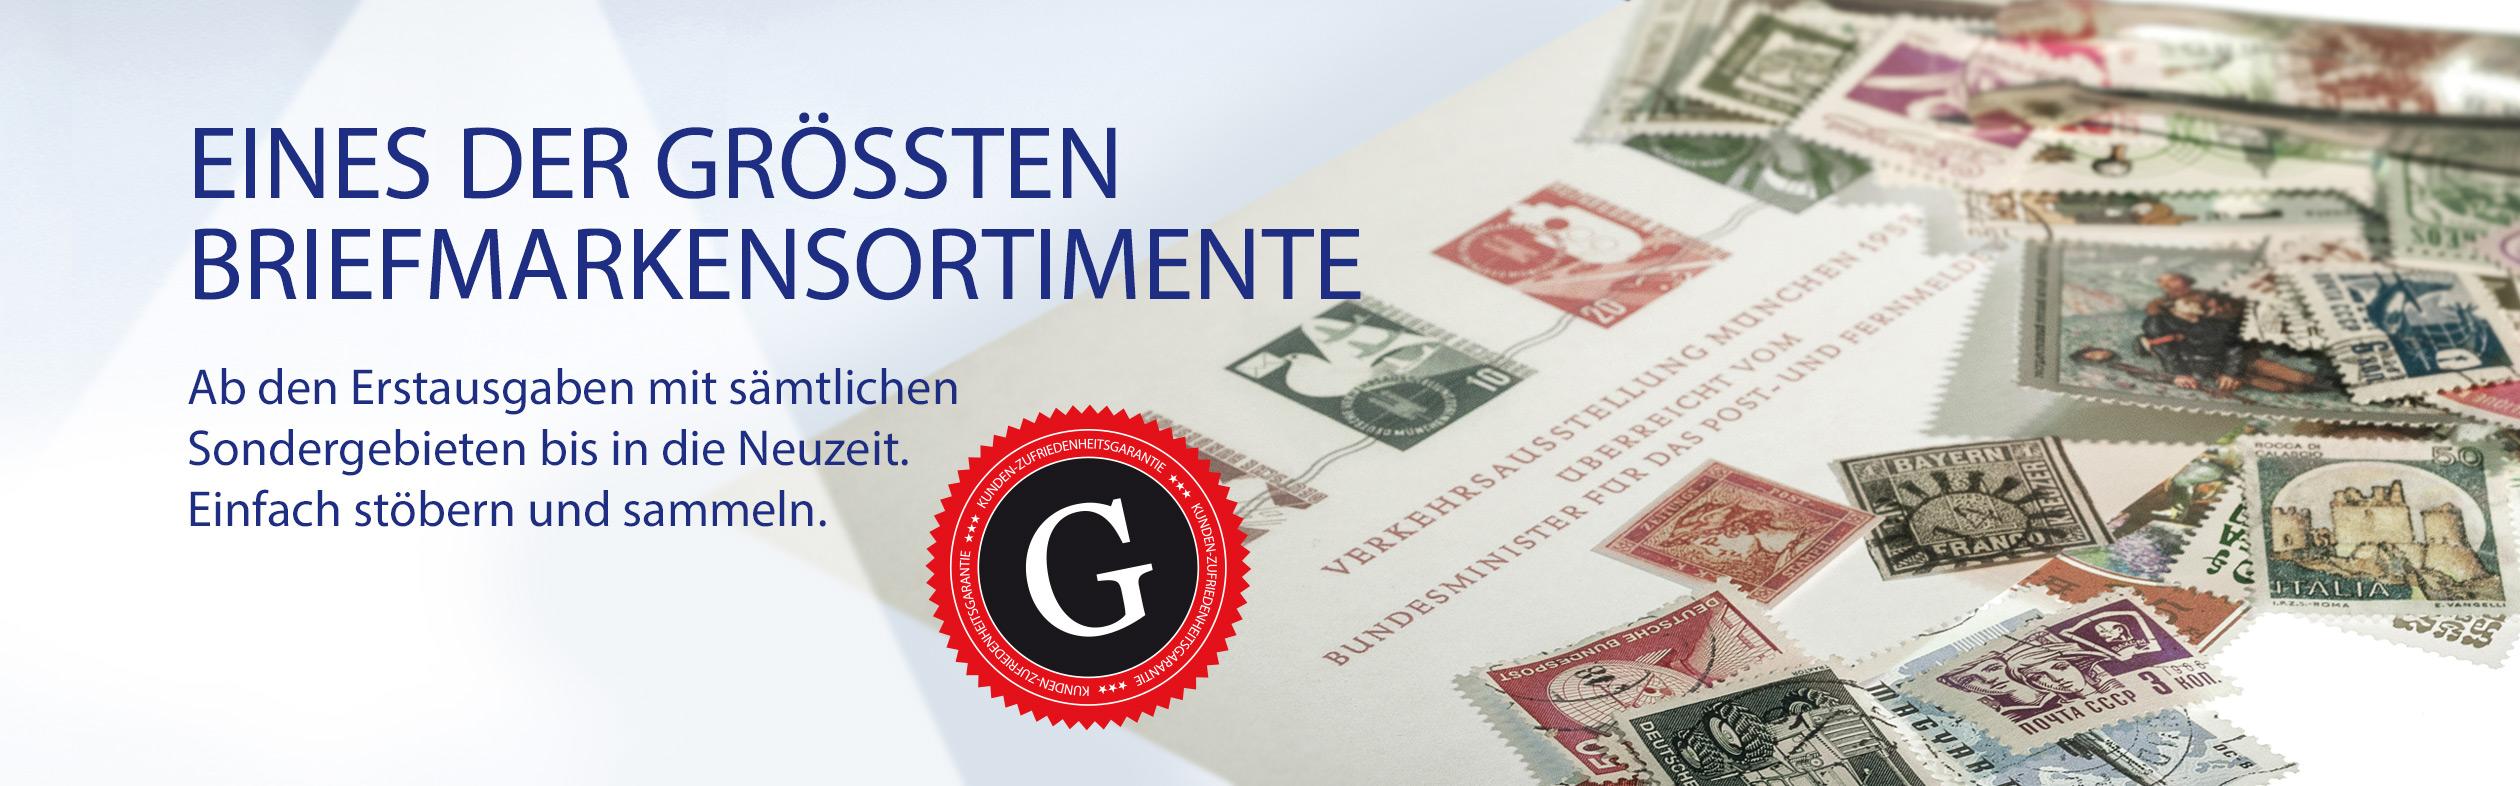 Nordamerika Us Briefmarken #186 Postfrisch Og H Pf Zertifikat Momen